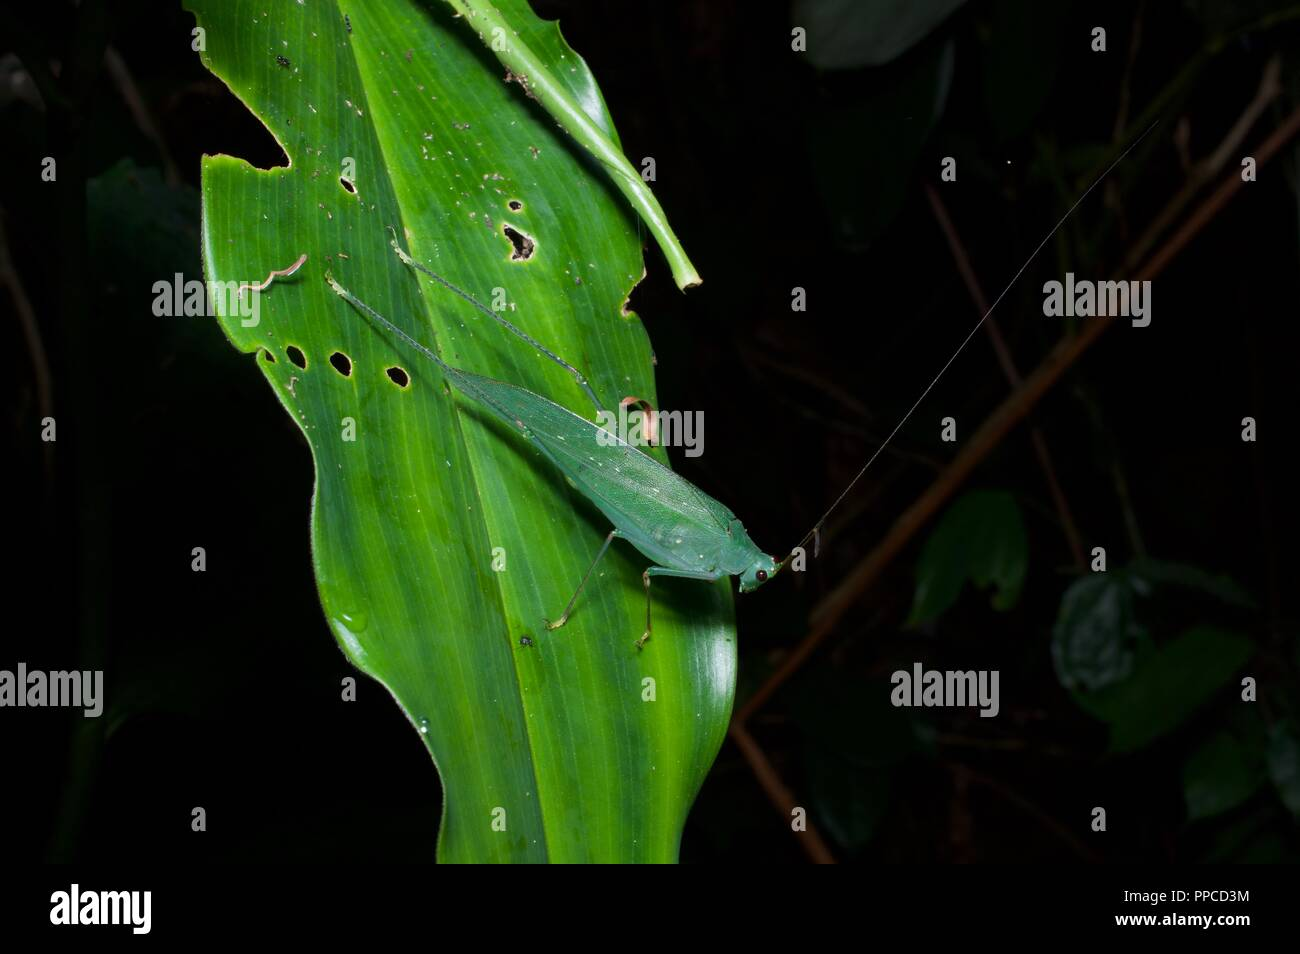 Ein Blatt nachahmen katydid (Familie Tettigoniidae) im Regenwald Laub in der Nacht in Bobiri Forest Reserve, Ghana, Westafrika Stockbild